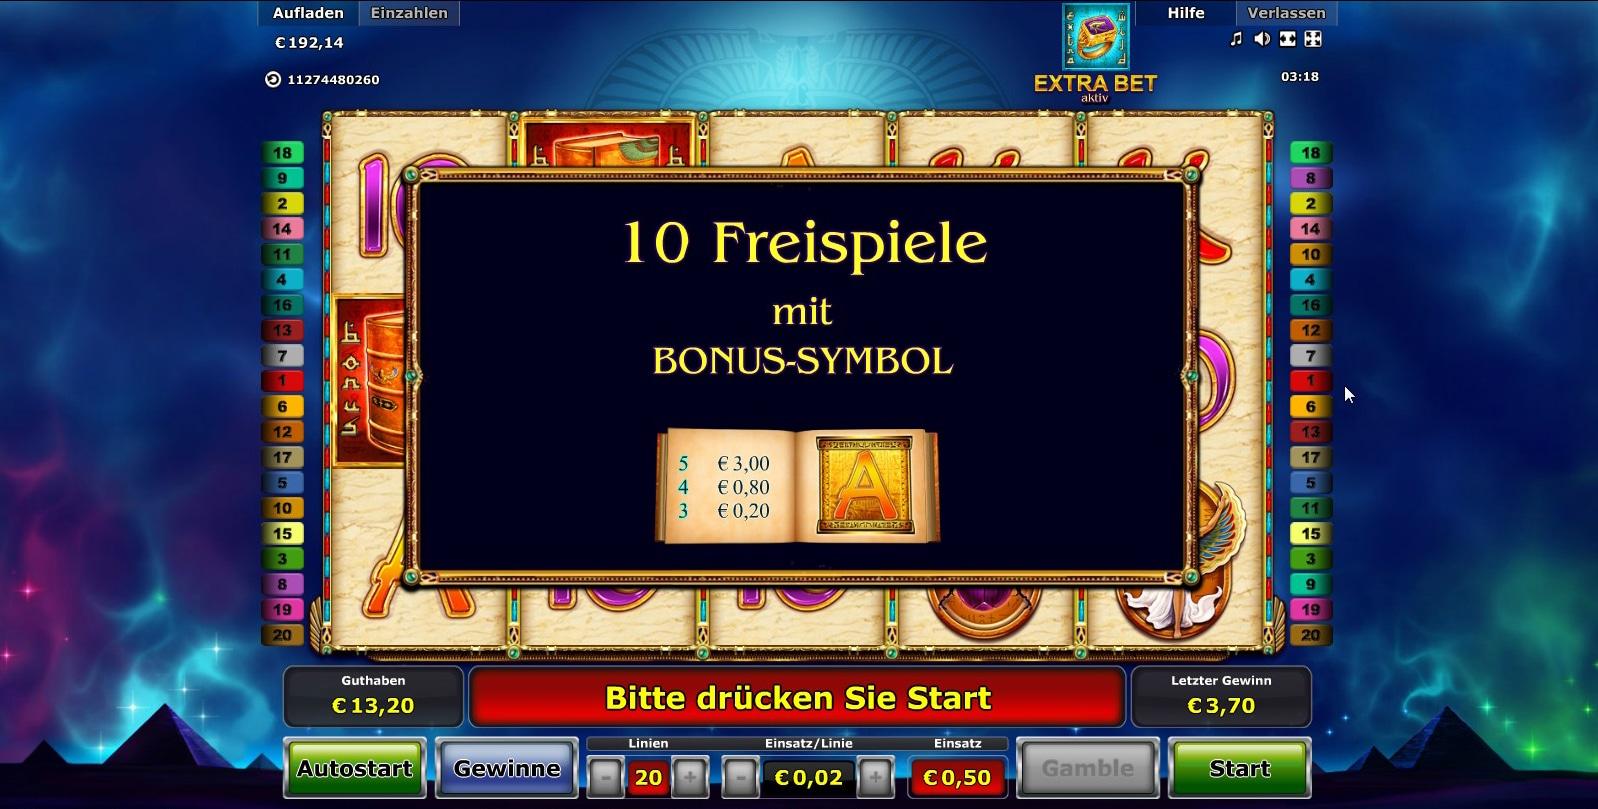 novoline paypal casino bonussymbol